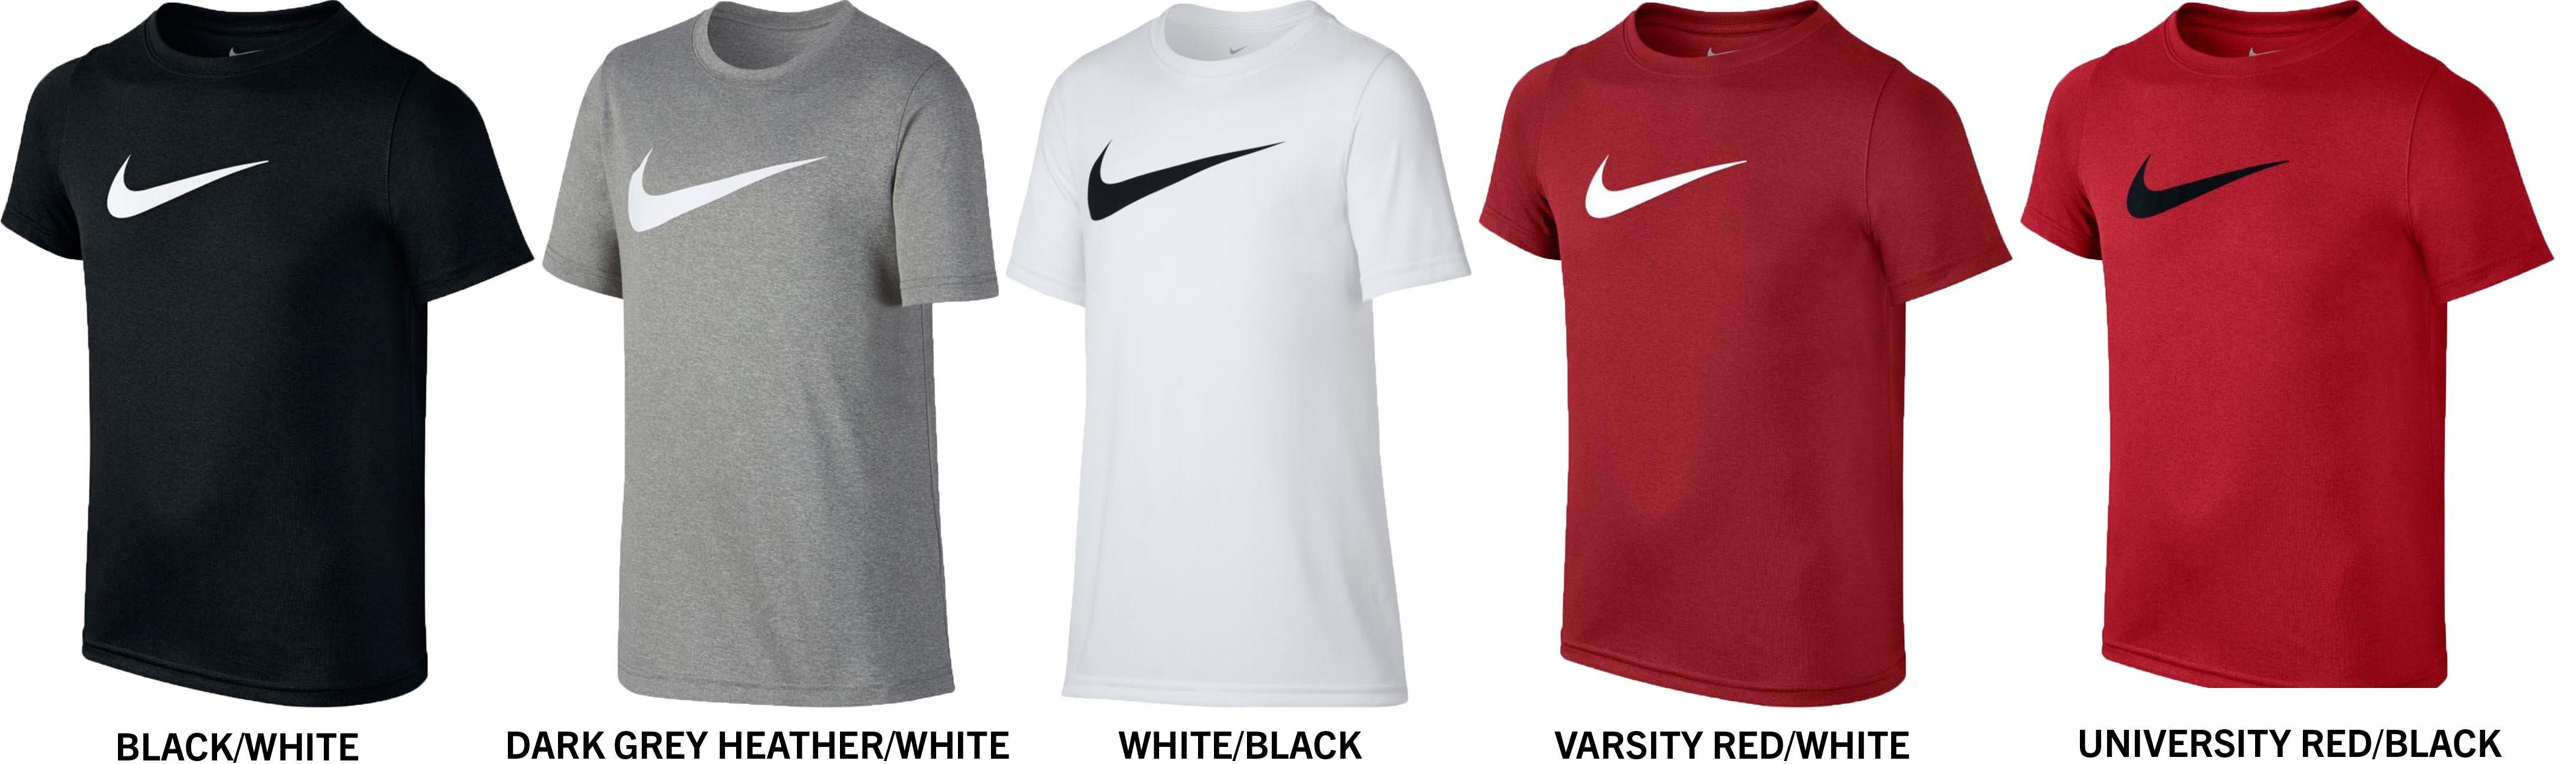 d55db2ae1c Nike Dri-FIT Boy s Short Sleeve Training Tee Shirt